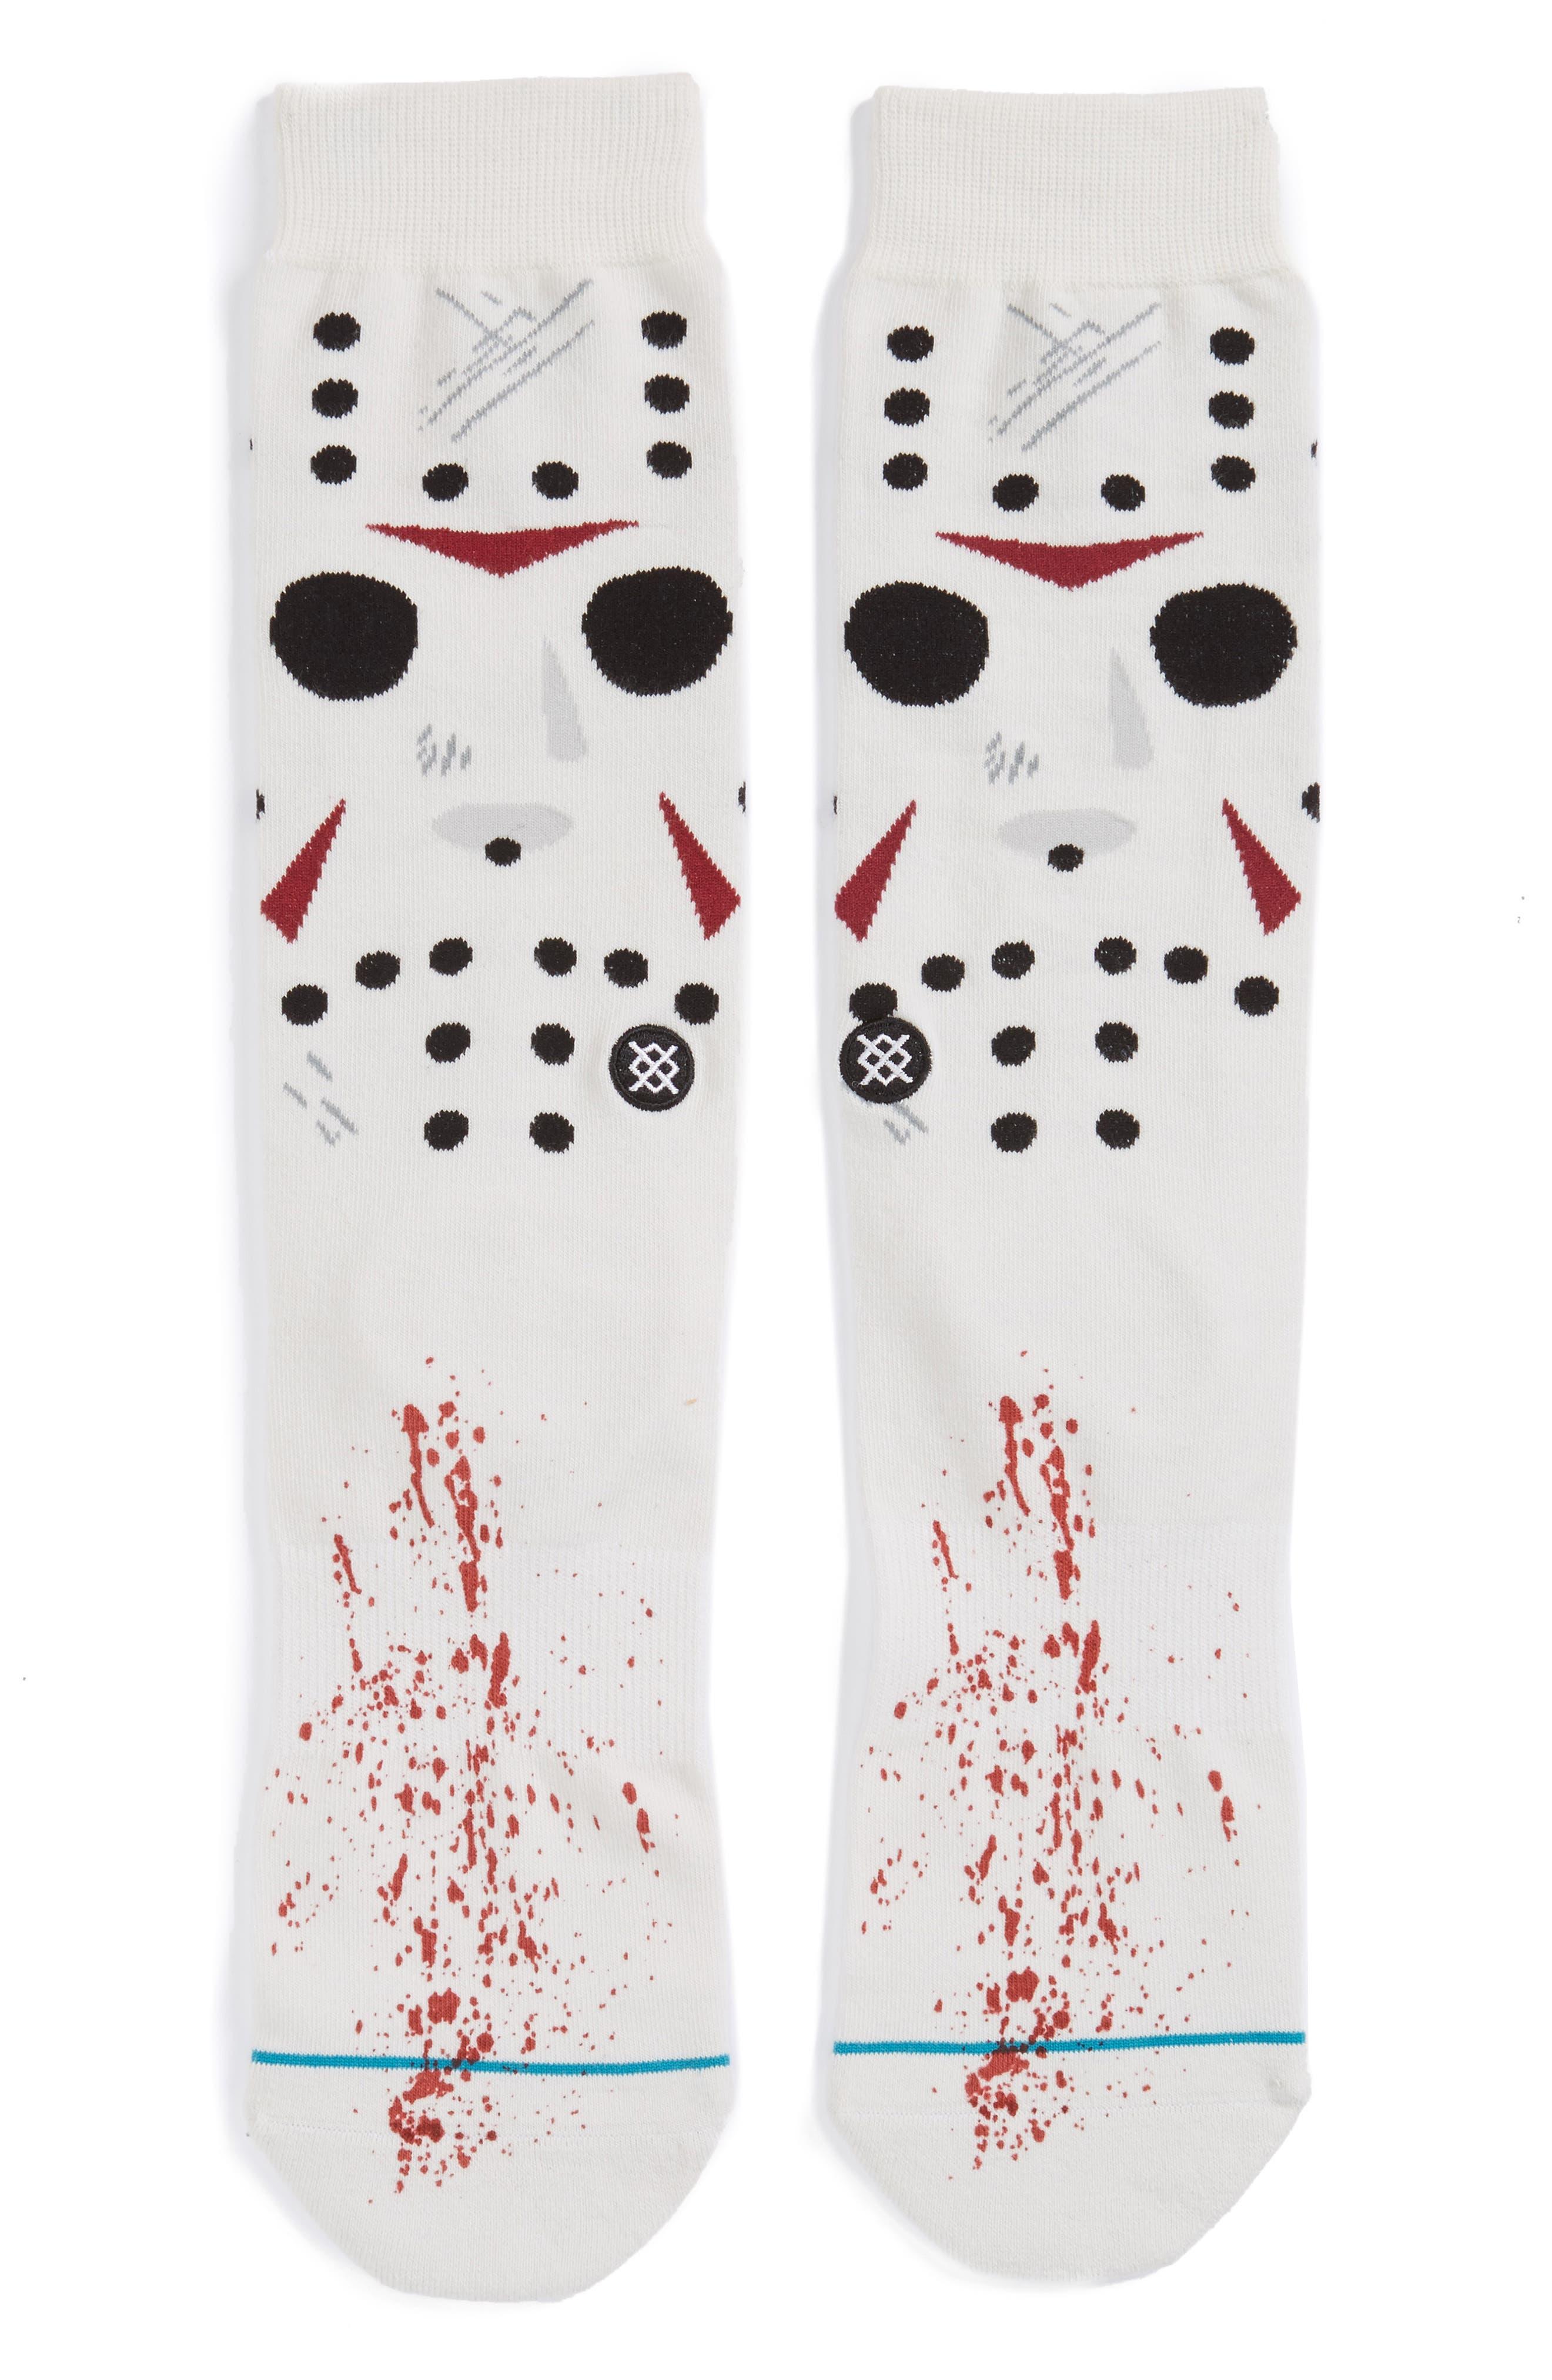 Jason - Legends of Horror Socks,                         Main,                         color, 100